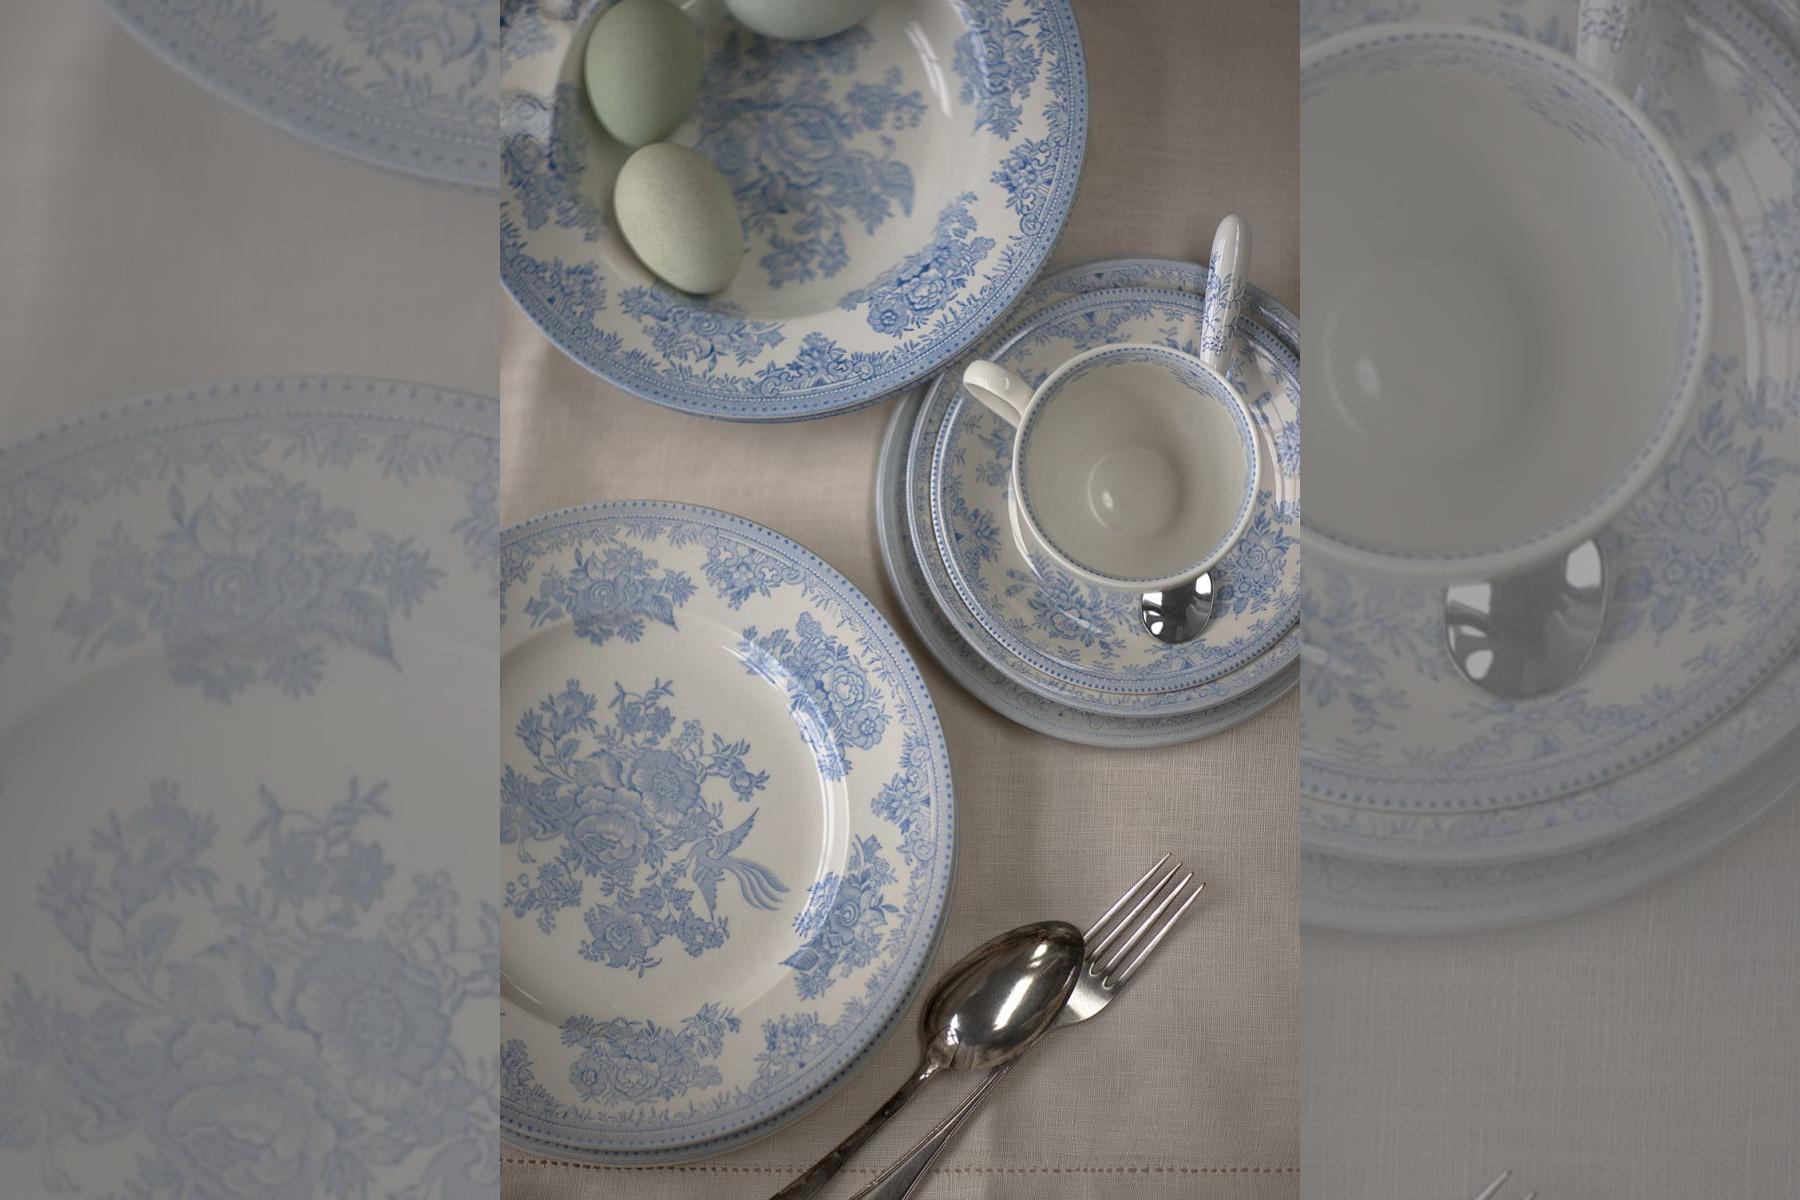 bridebook.co.uk-prezola white and blue china